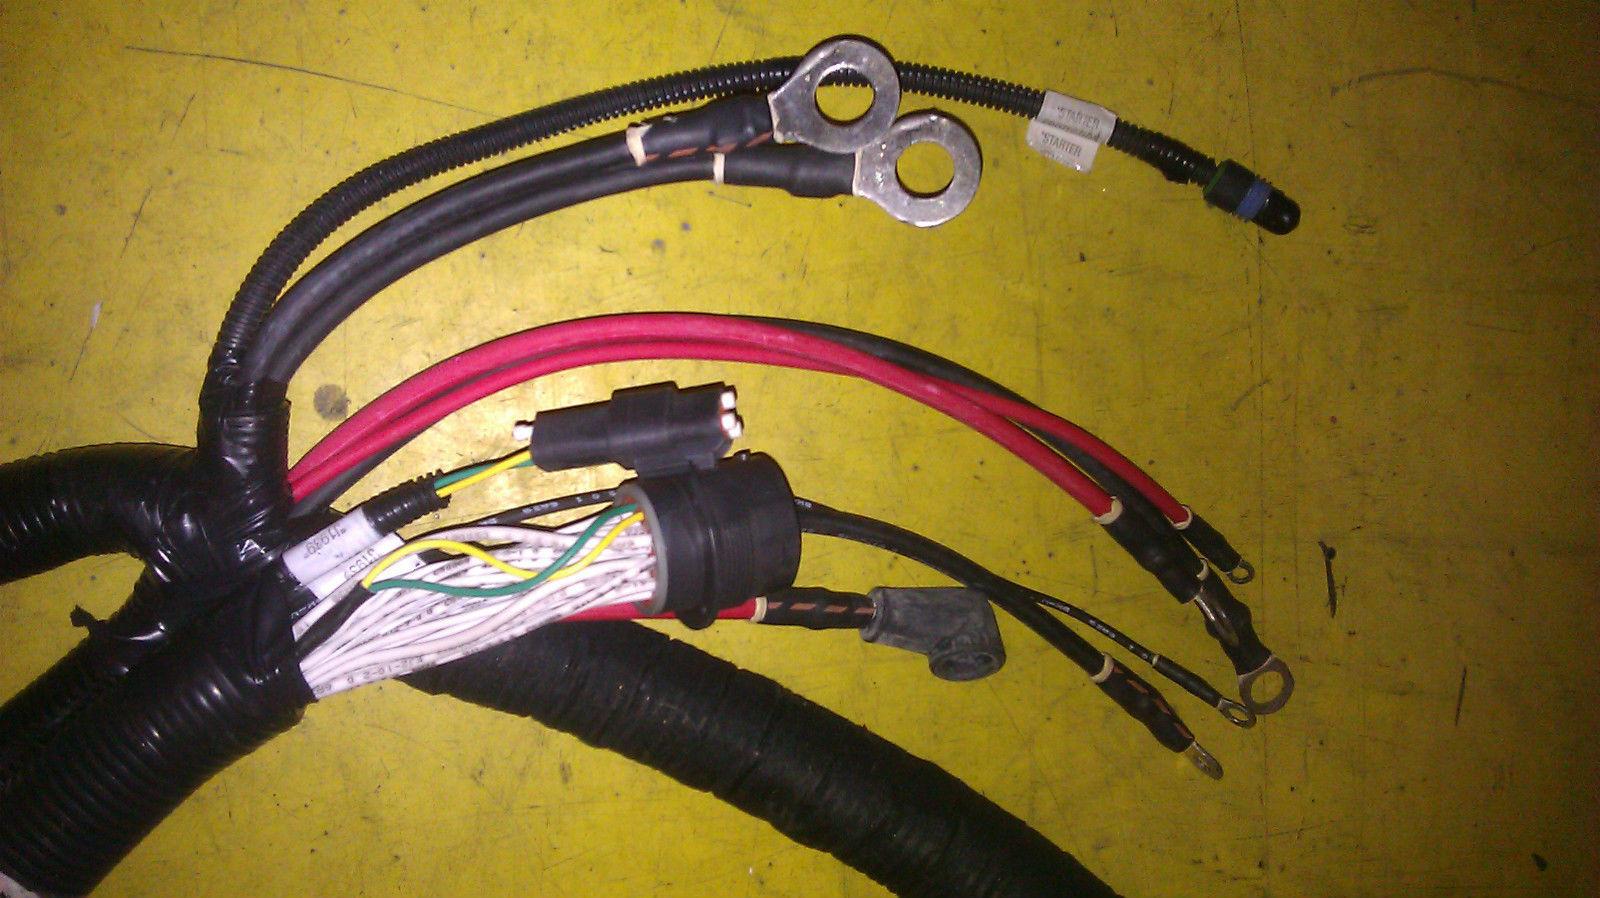 genuine mack truck wiring harness 41mr5886m - other business & industrial mack truck wiring harness #2